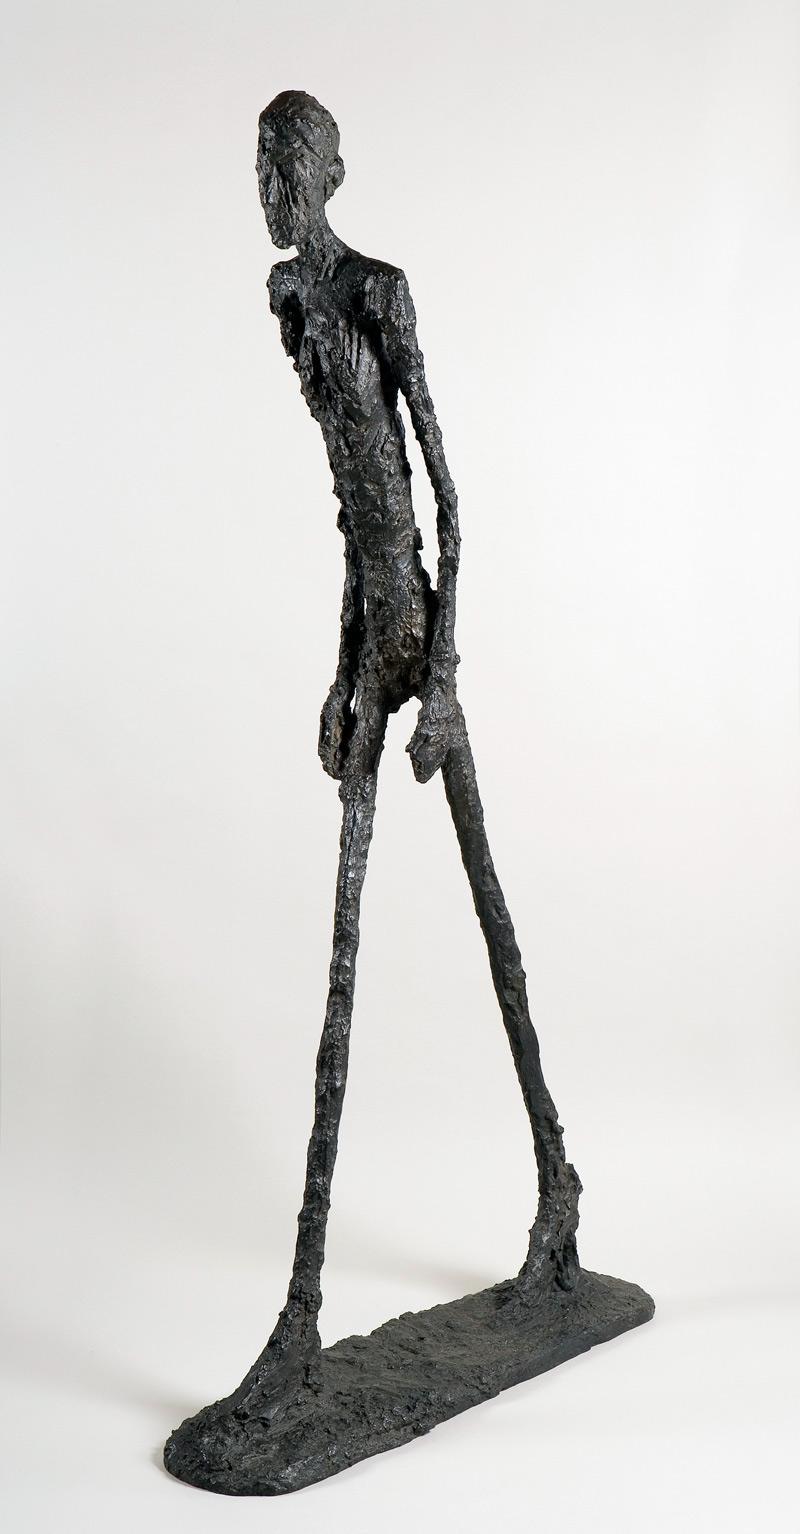 alberto-giacometti-walking-man-i-1960.jpg